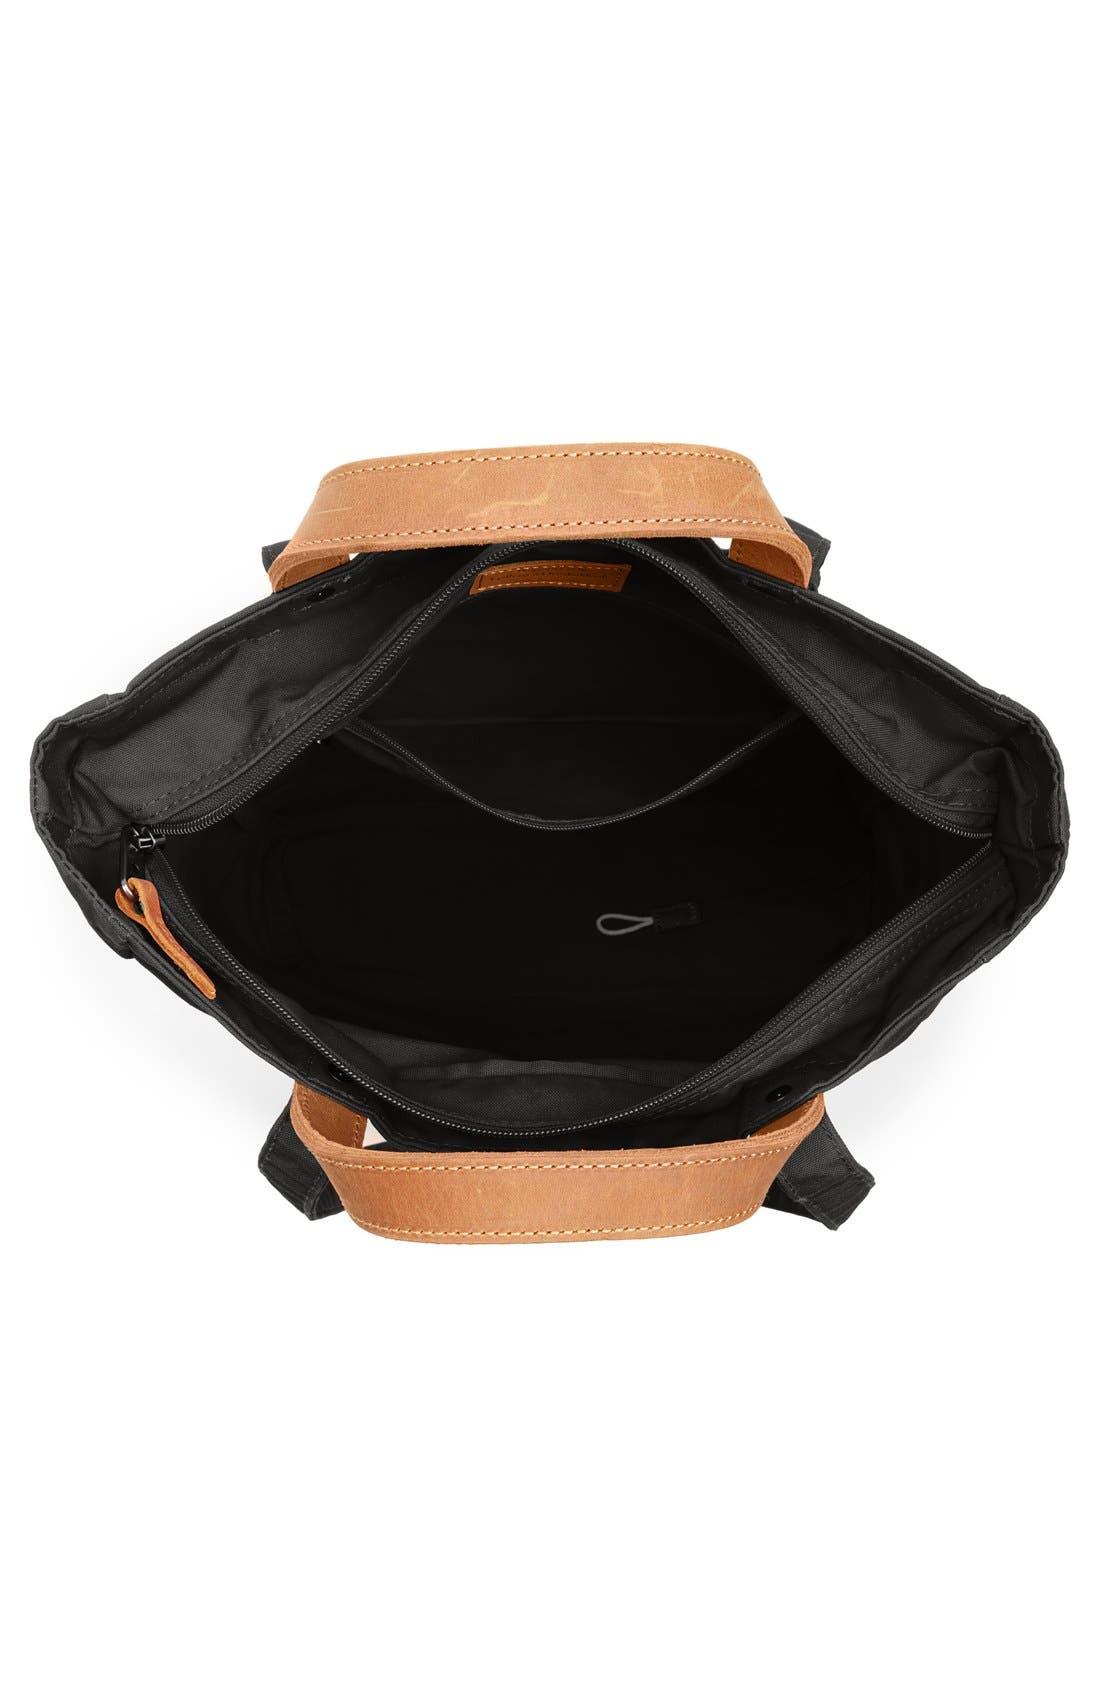 'Totepack No.1' Water Resistant Tote,                             Alternate thumbnail 5, color,                             BLACK